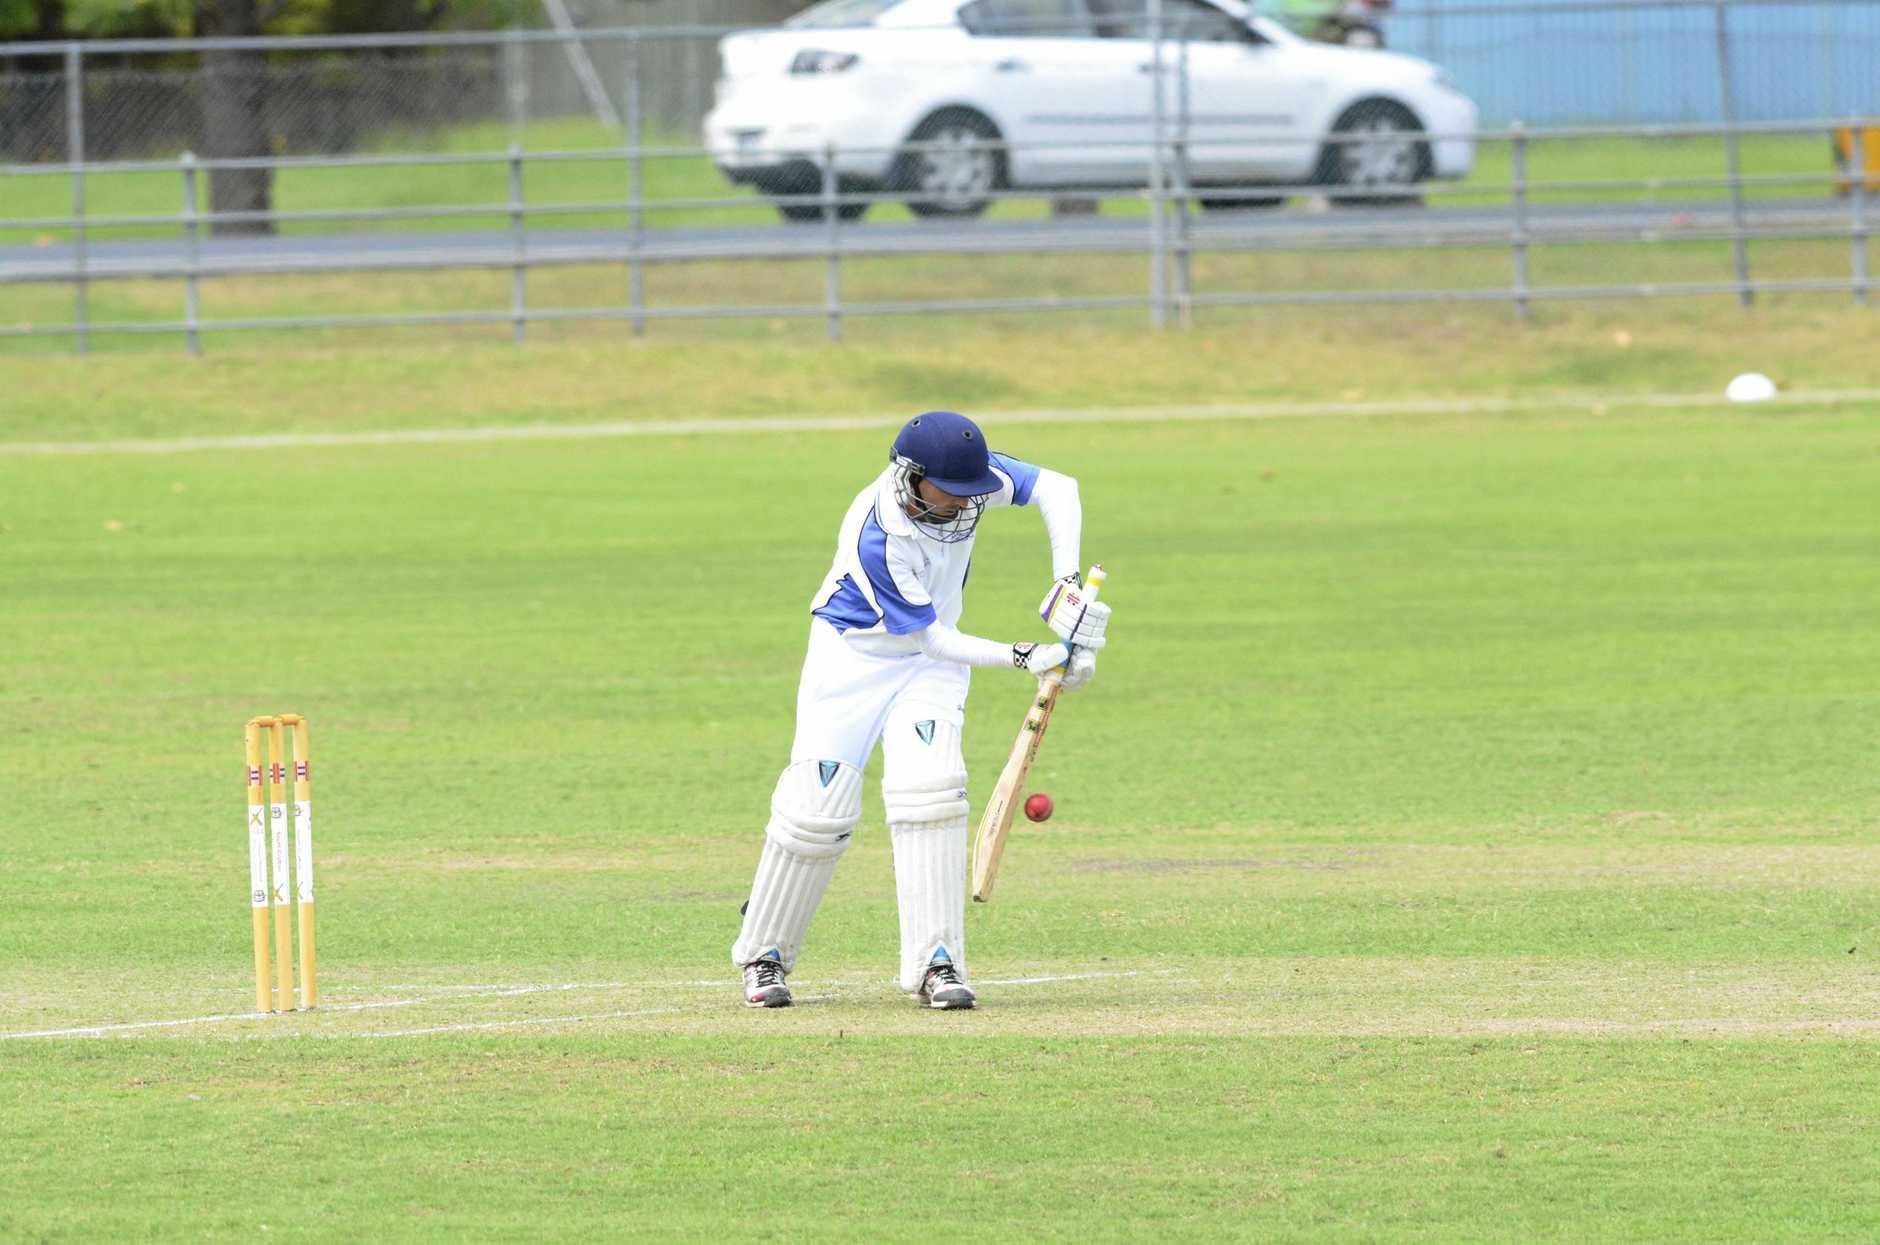 Andrew Buchanan batting for Tucabia Copmanhurst.